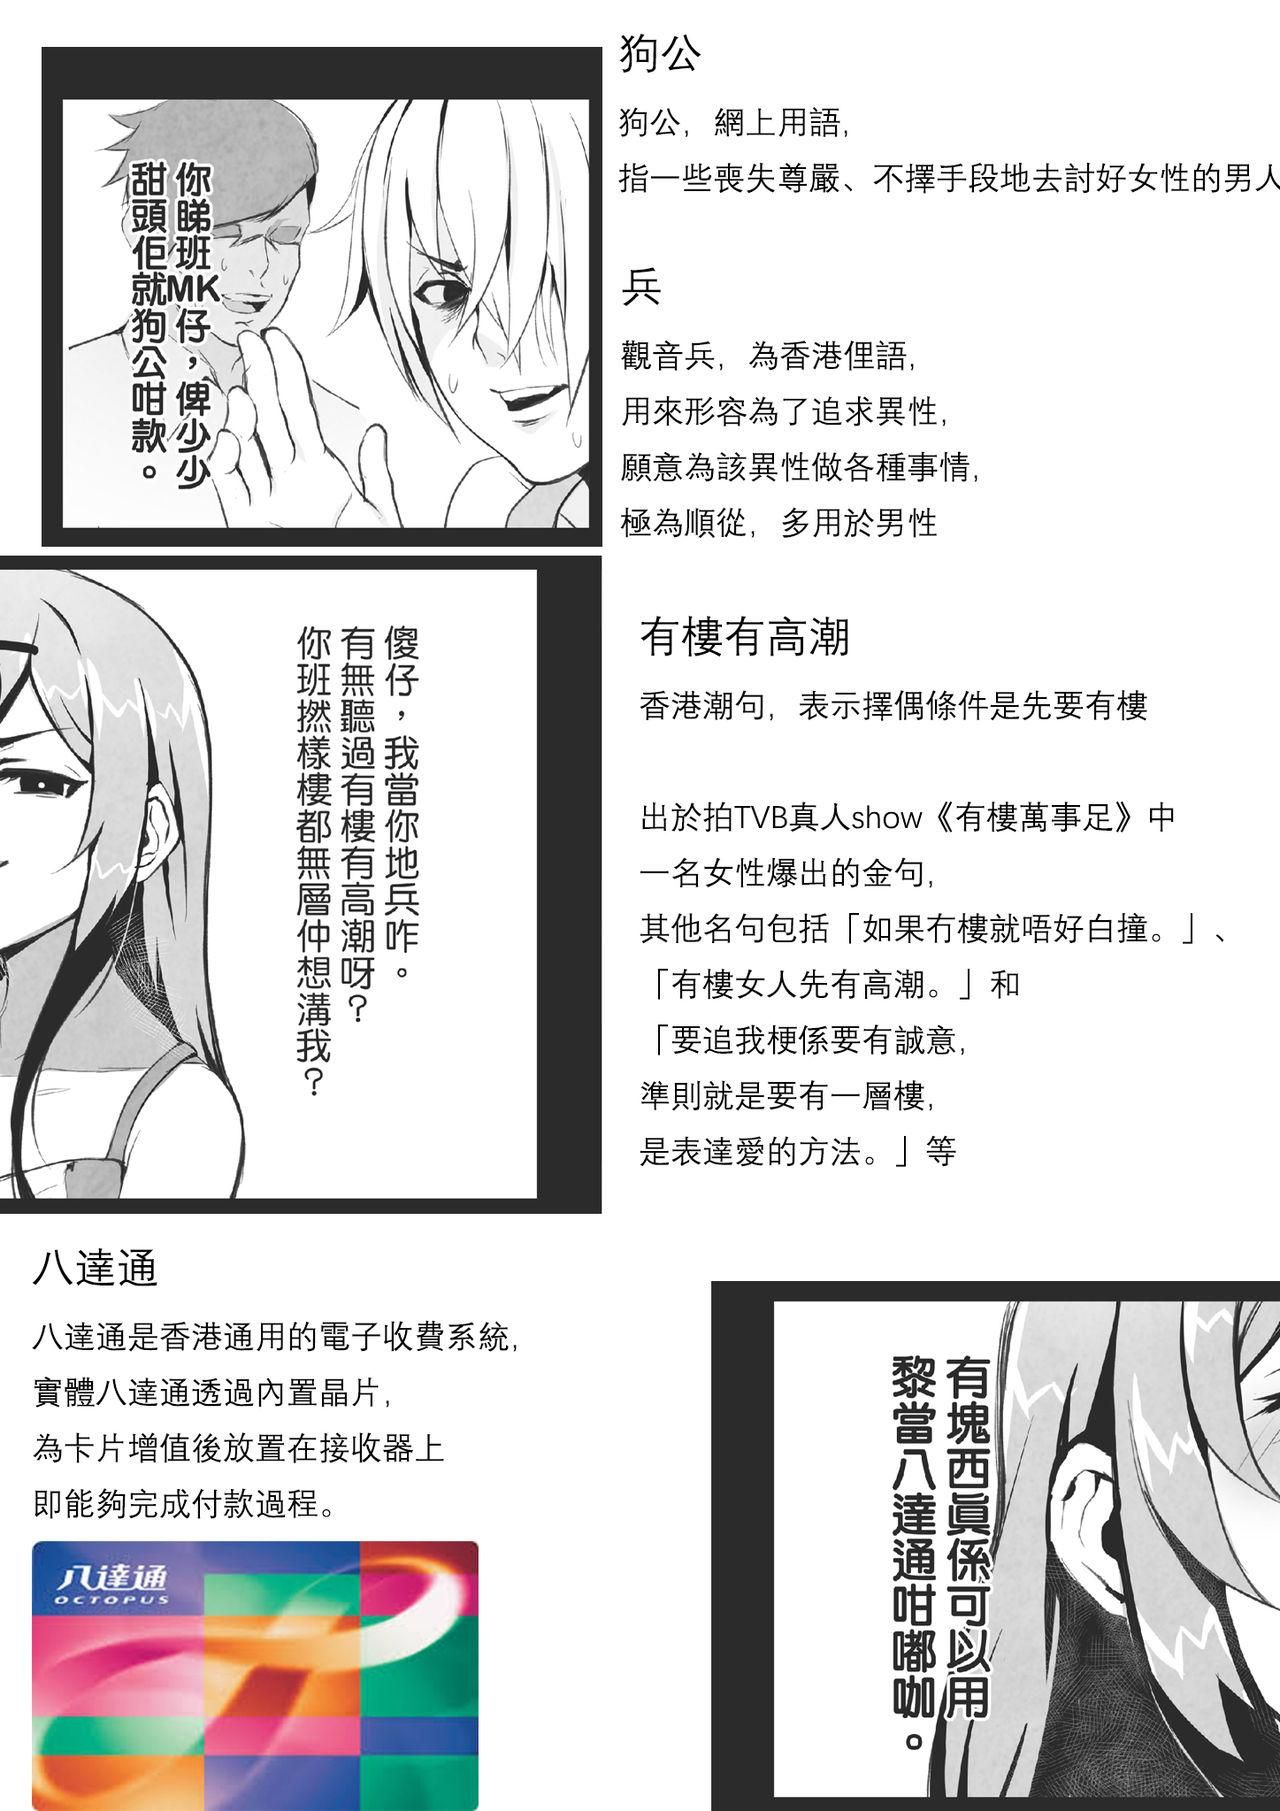 [Gantou Ikunoro] MK girl embodies the spirit of Hong Kong under the Lion Rock [Chinese]  [君廣東話本當上手機翻漢化組] v2 36